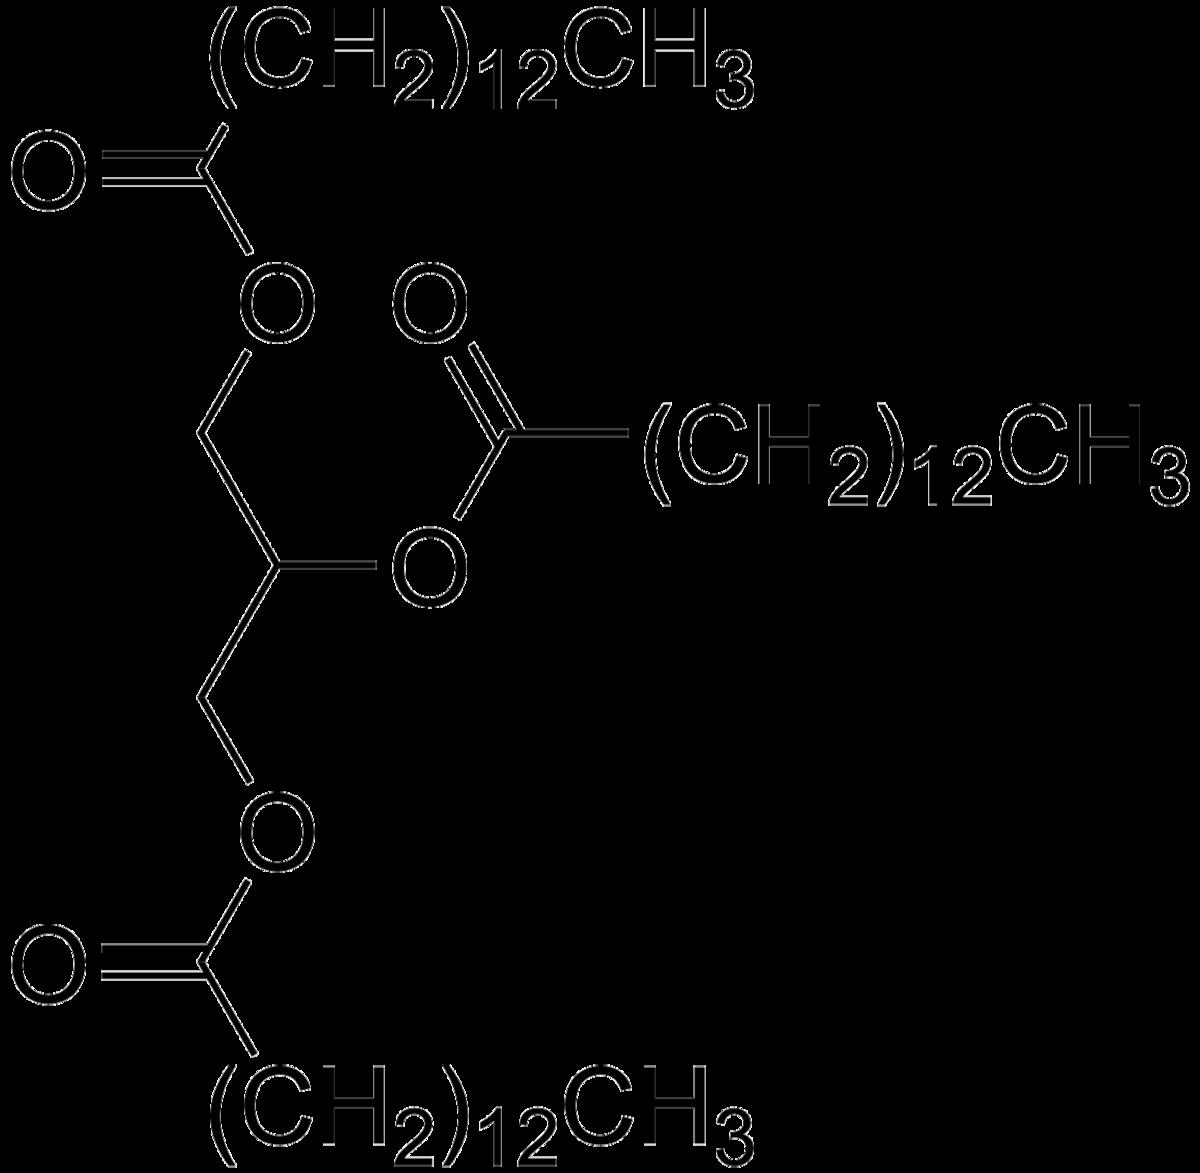 Grasa wikipedia la enciclopedia libre for Que significa molecula